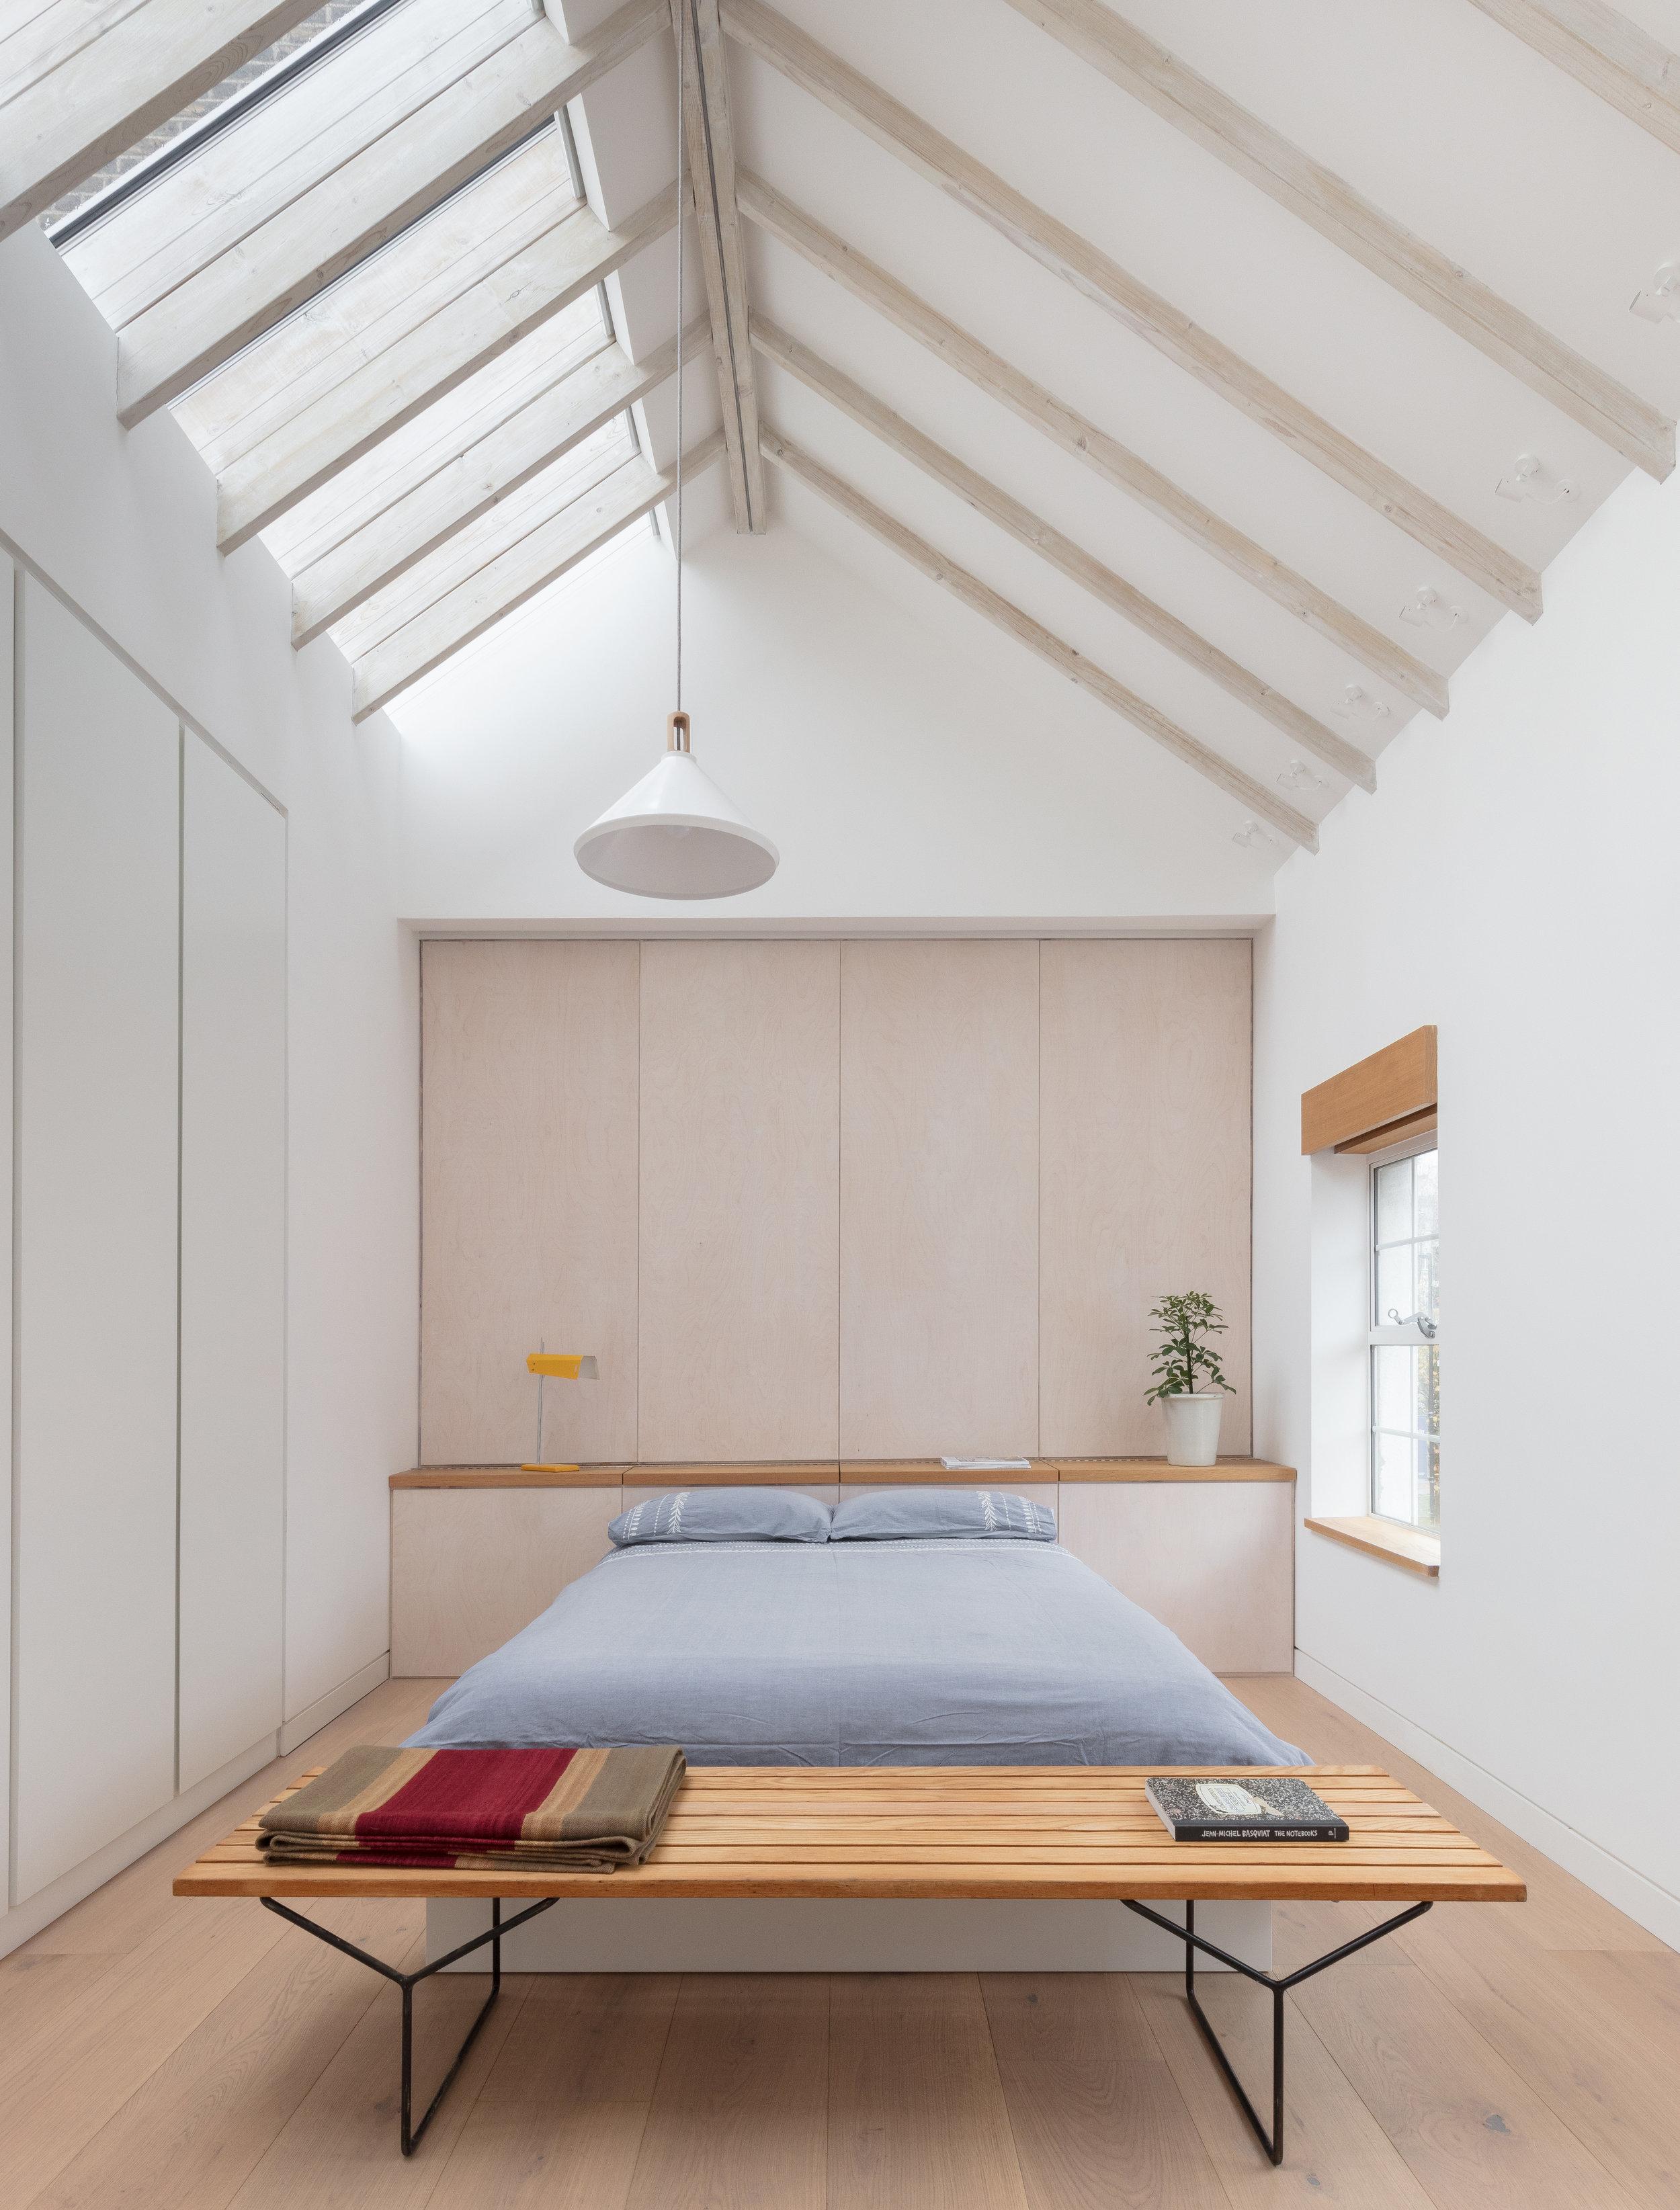 Vine Architecture Studio - Mile End Road-12 © Nicholas Worley.jpg